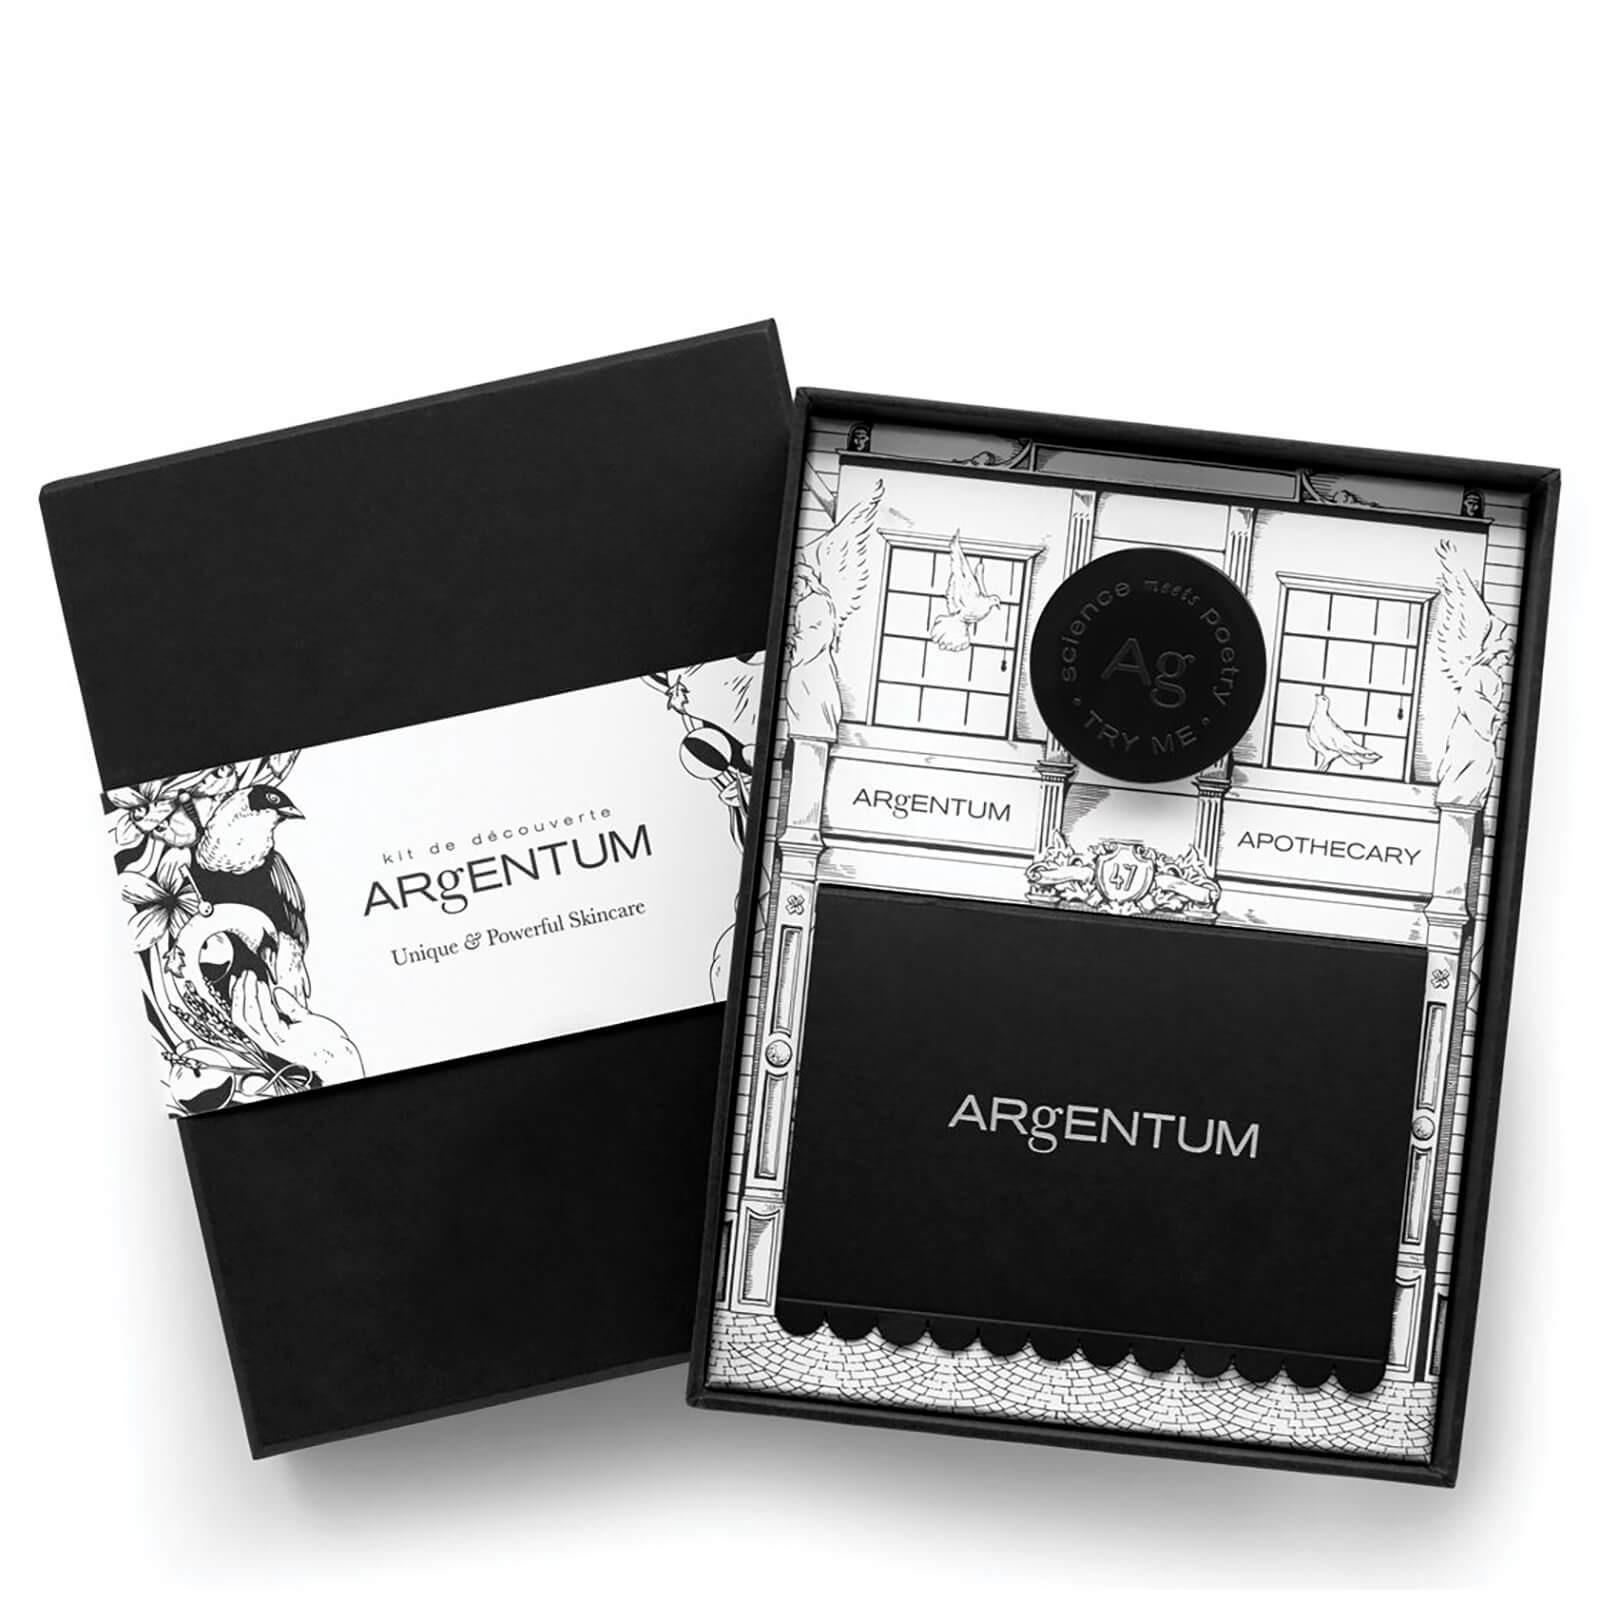 ARgENTUM 入门护肤礼盒(银油3ml+银乳10ml+银皂20g+银霜15ml)